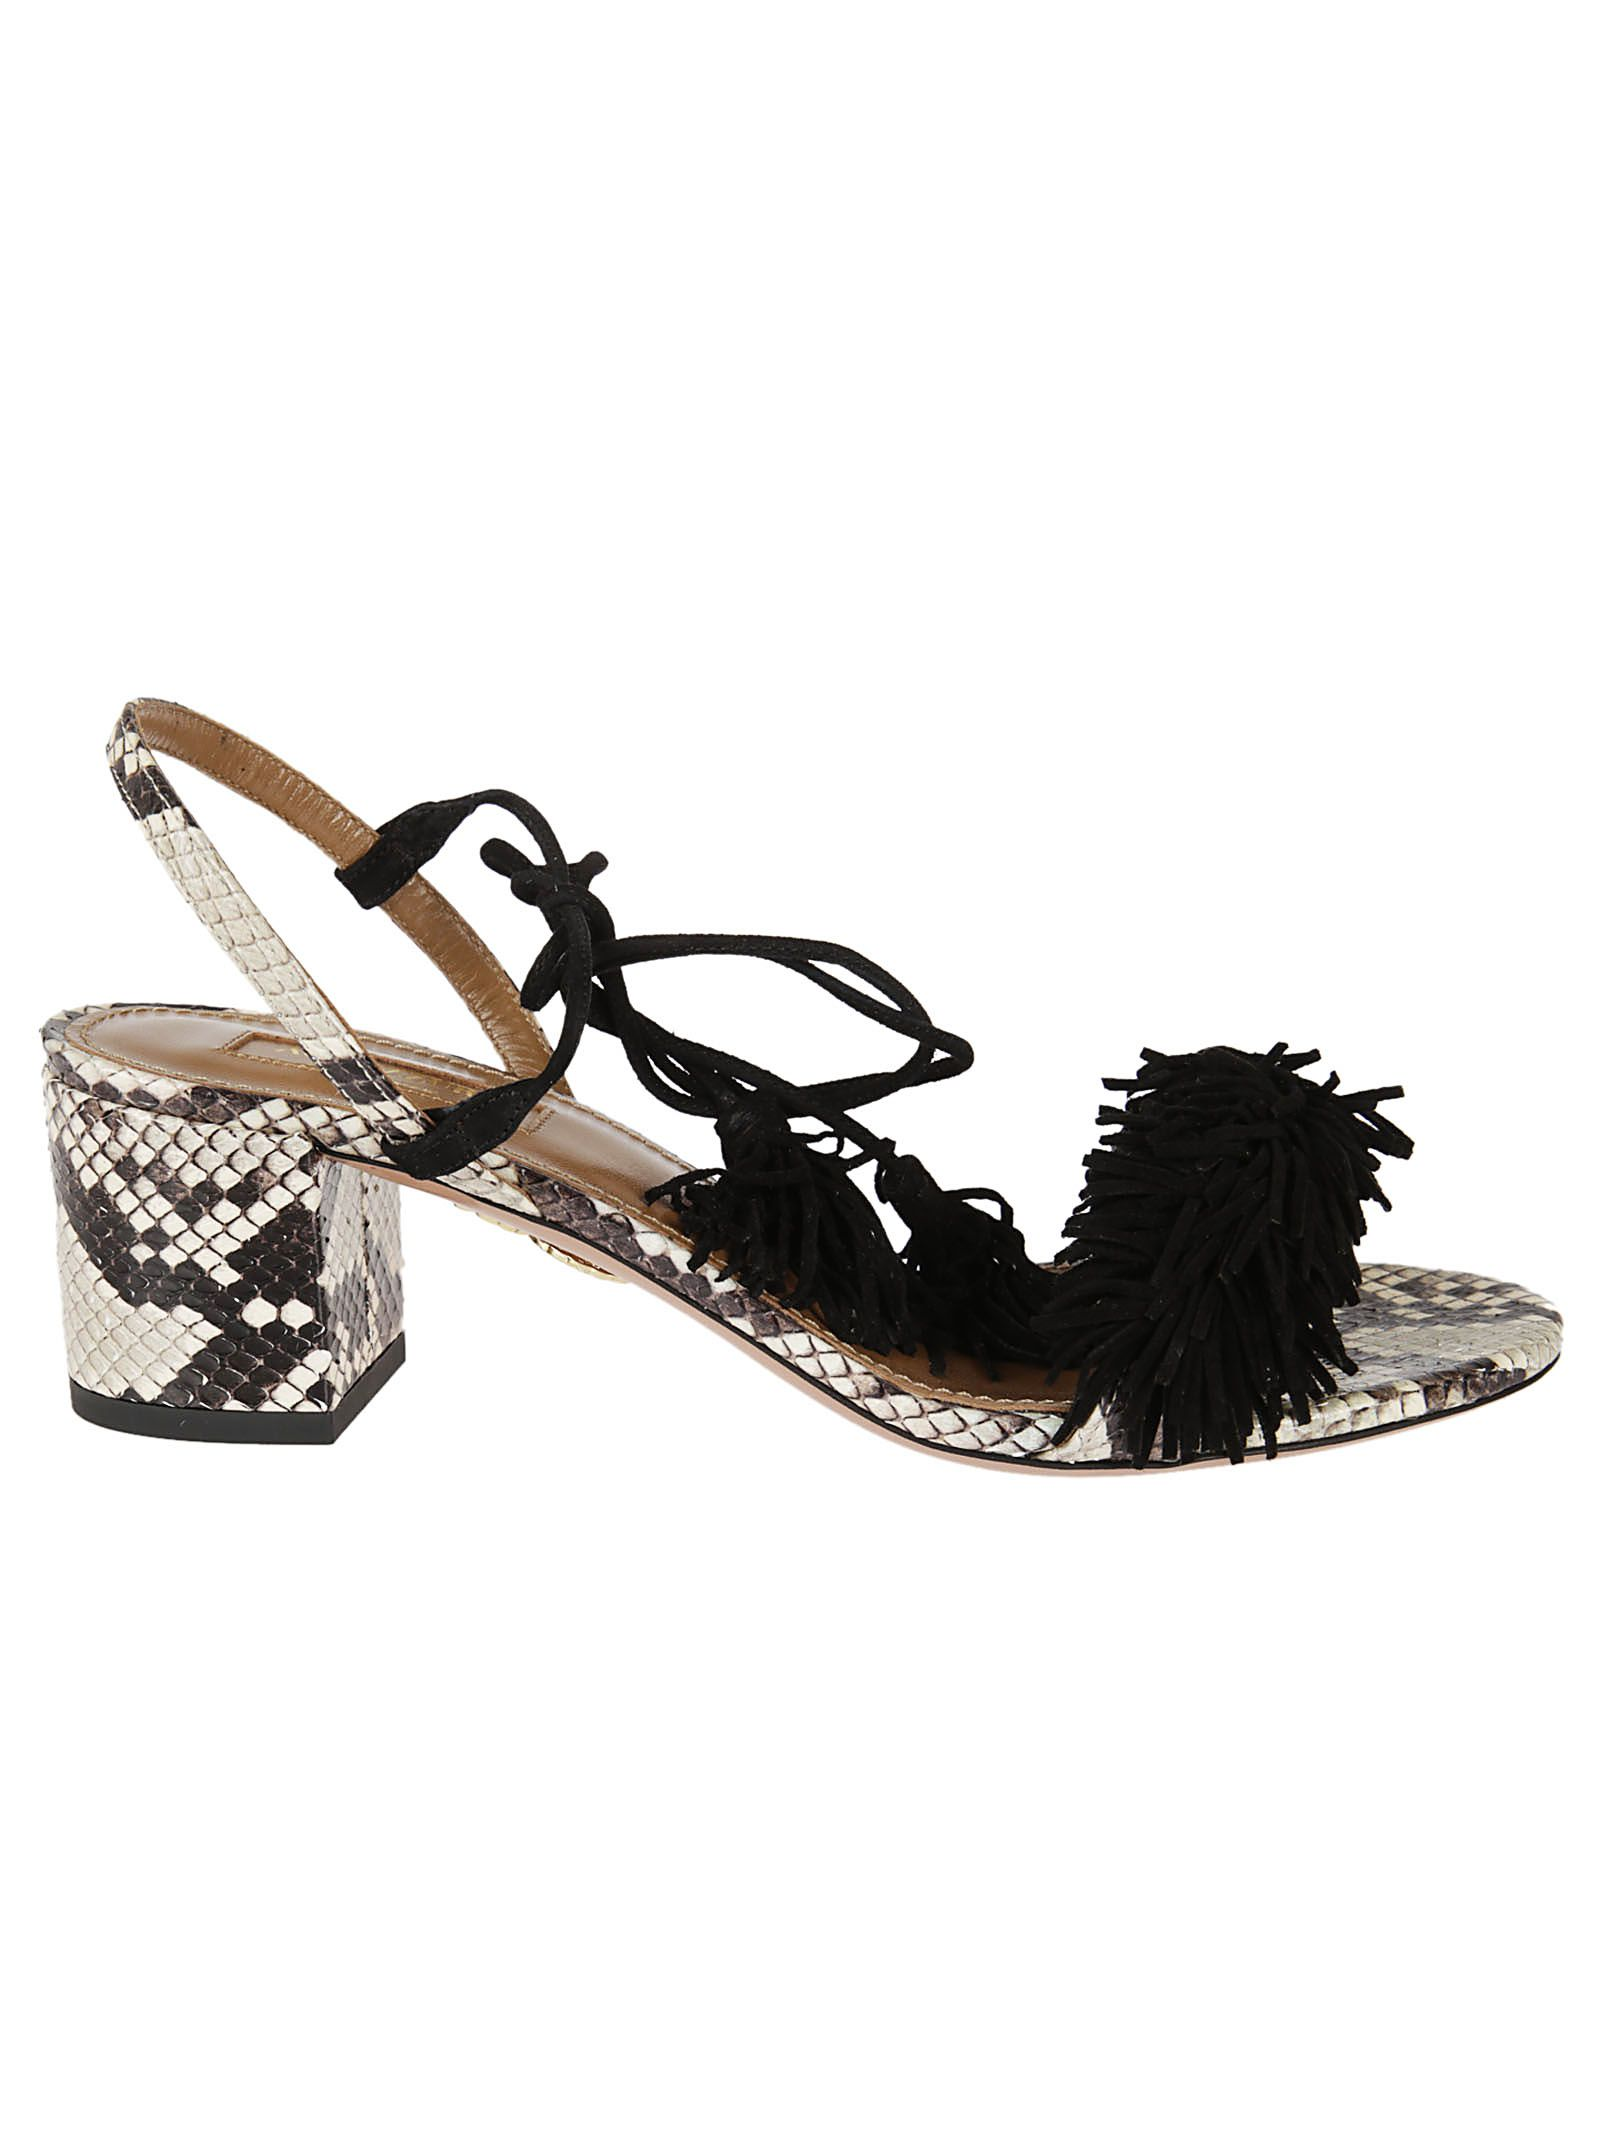 Aquazzura Snakeskin Wild Thing Sandals